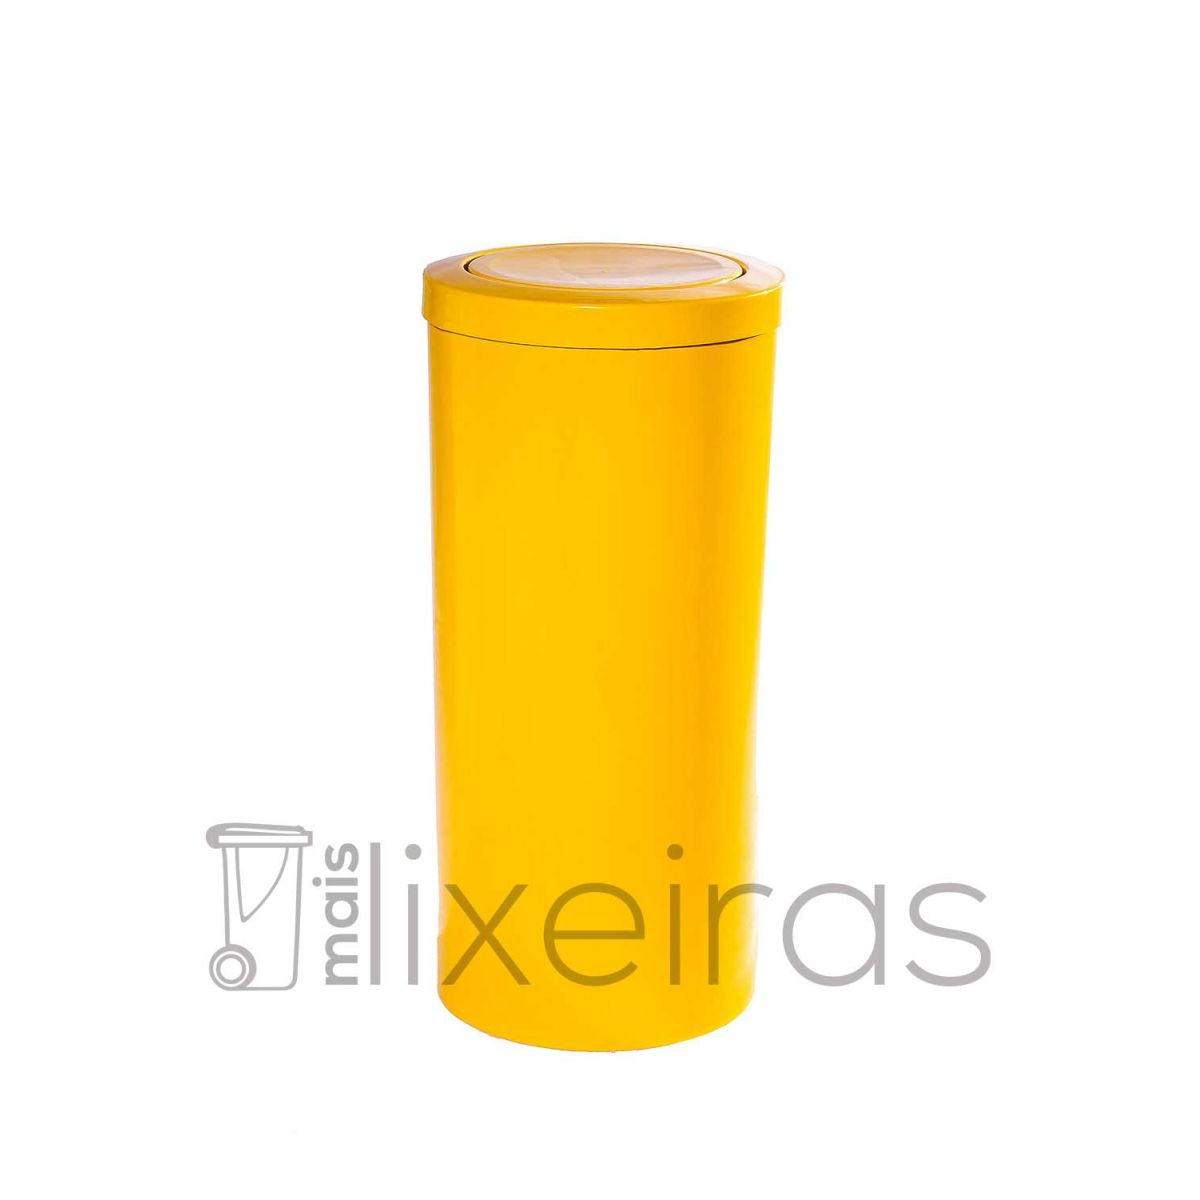 Lixeira plástica com tampa flip top - 25 litros